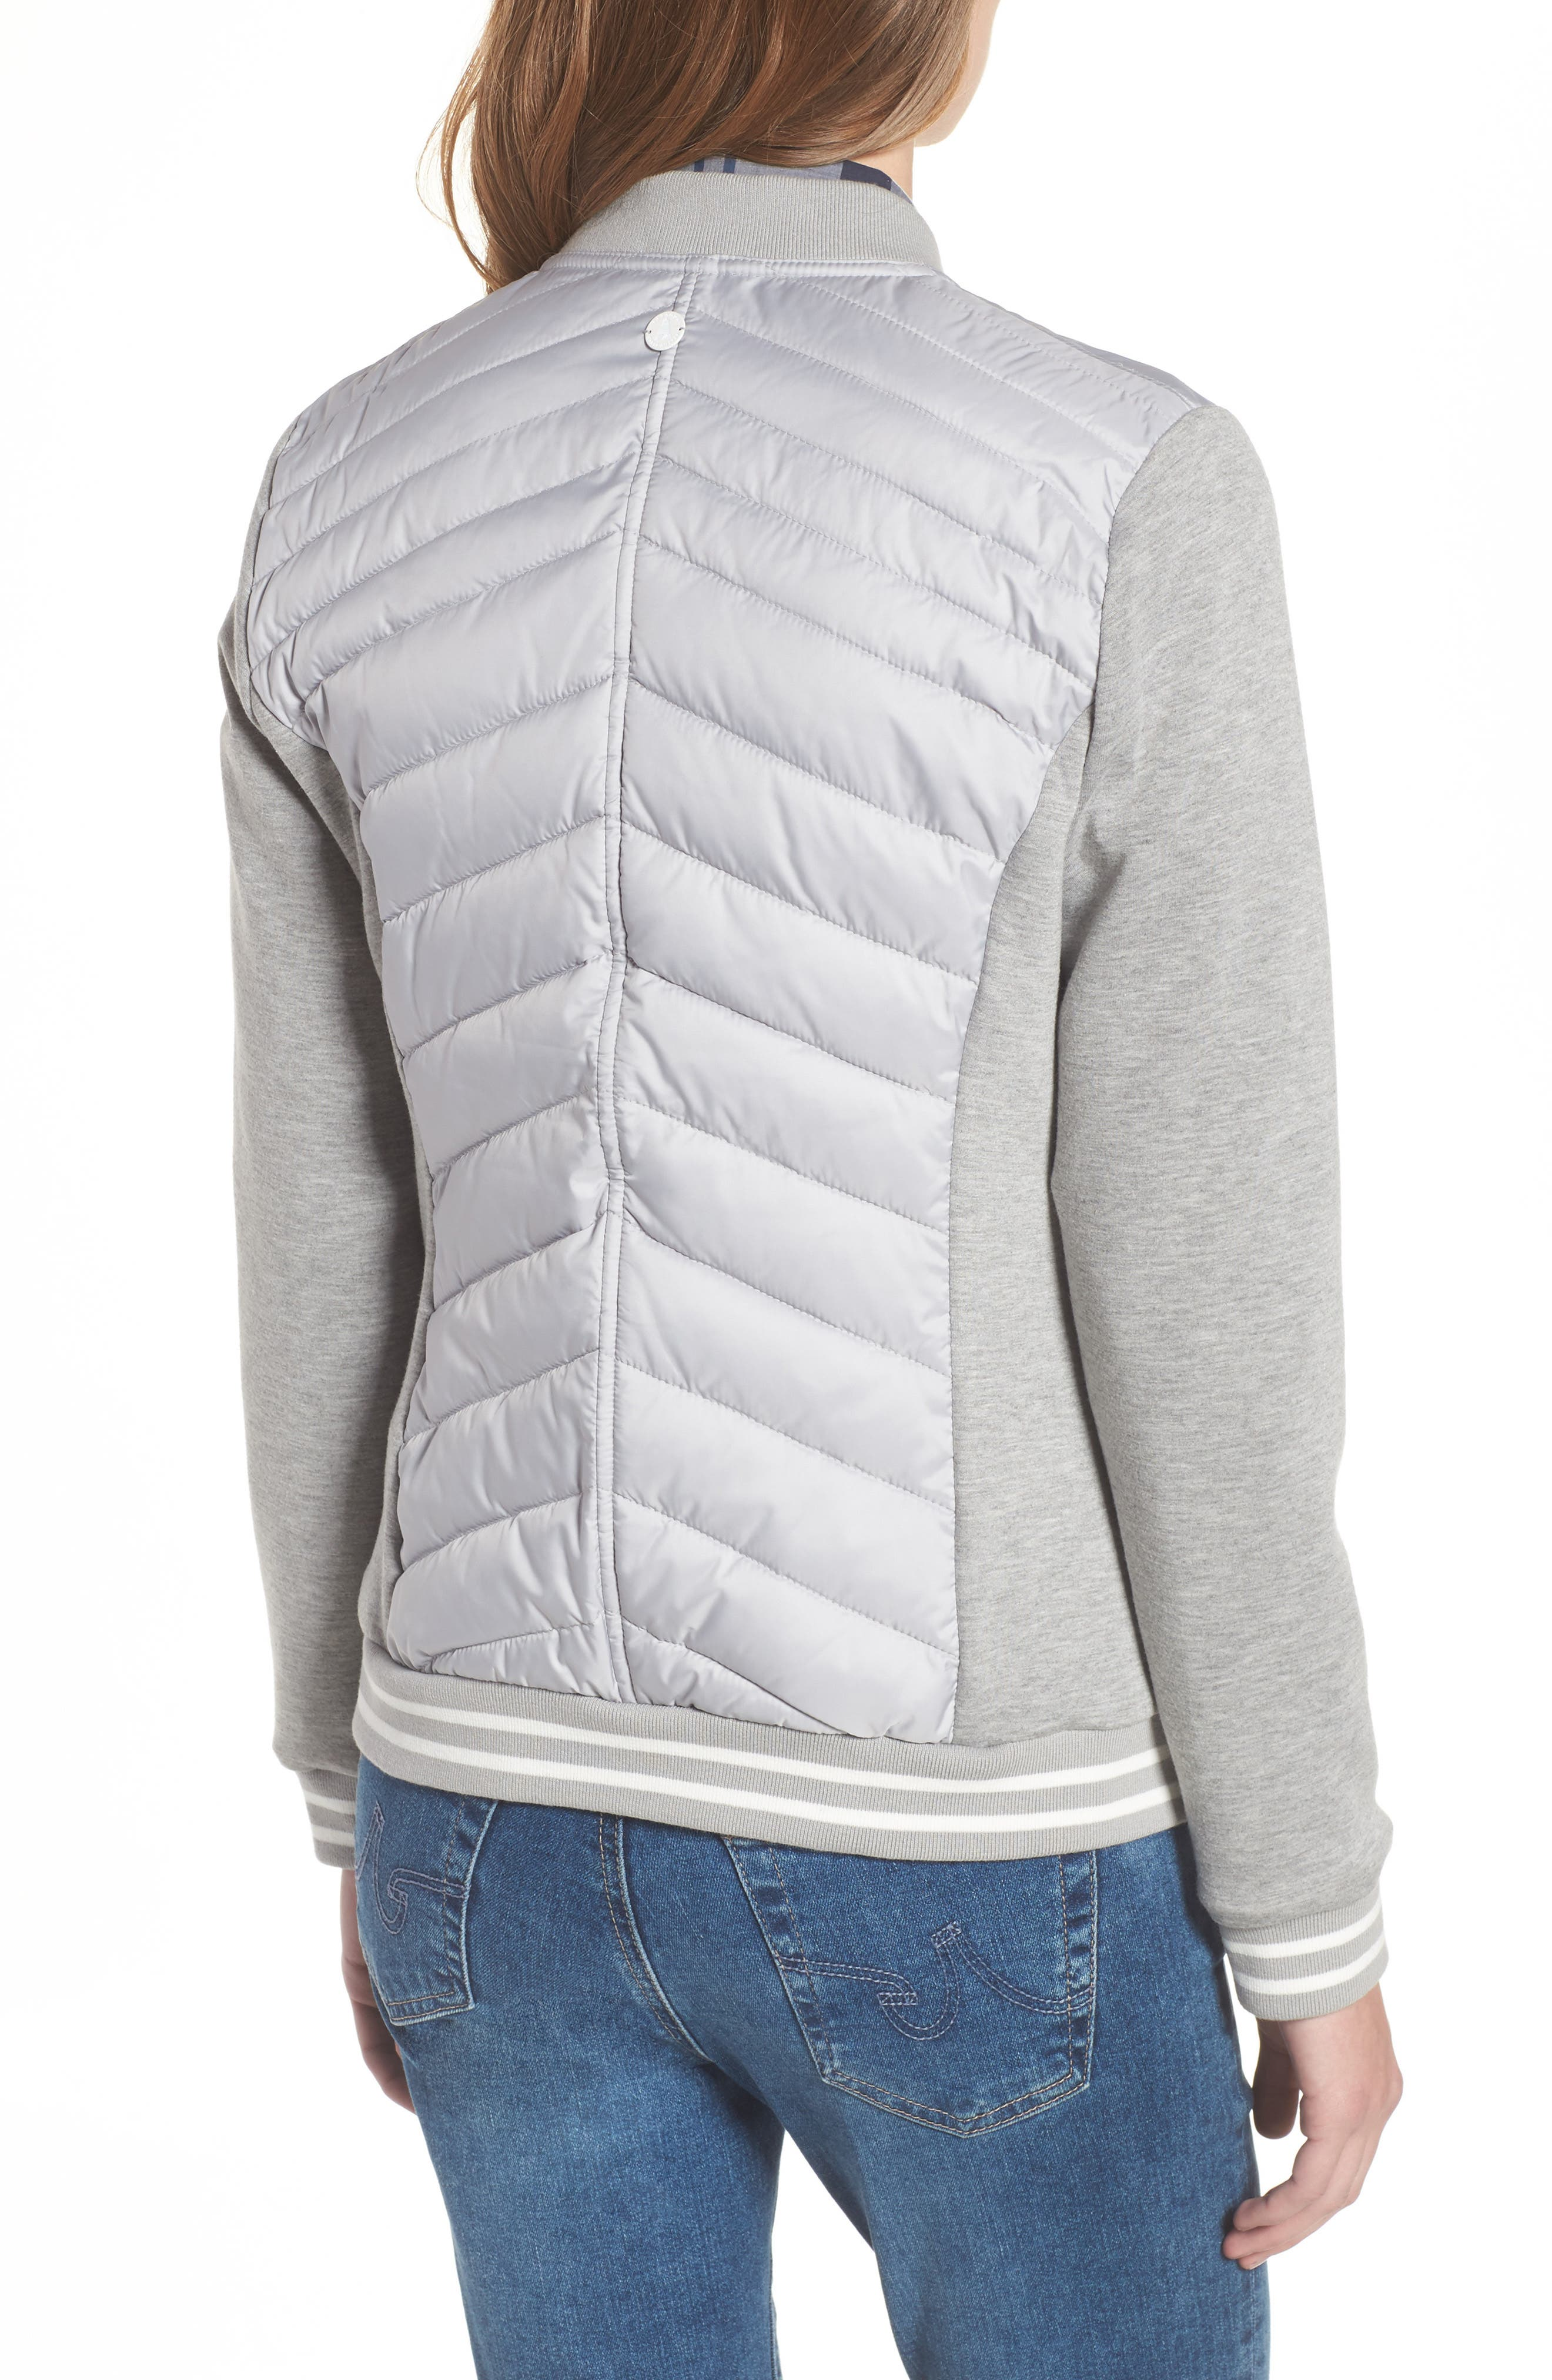 Pembrey Sweatshirt Jacket,                             Alternate thumbnail 2, color,                             050